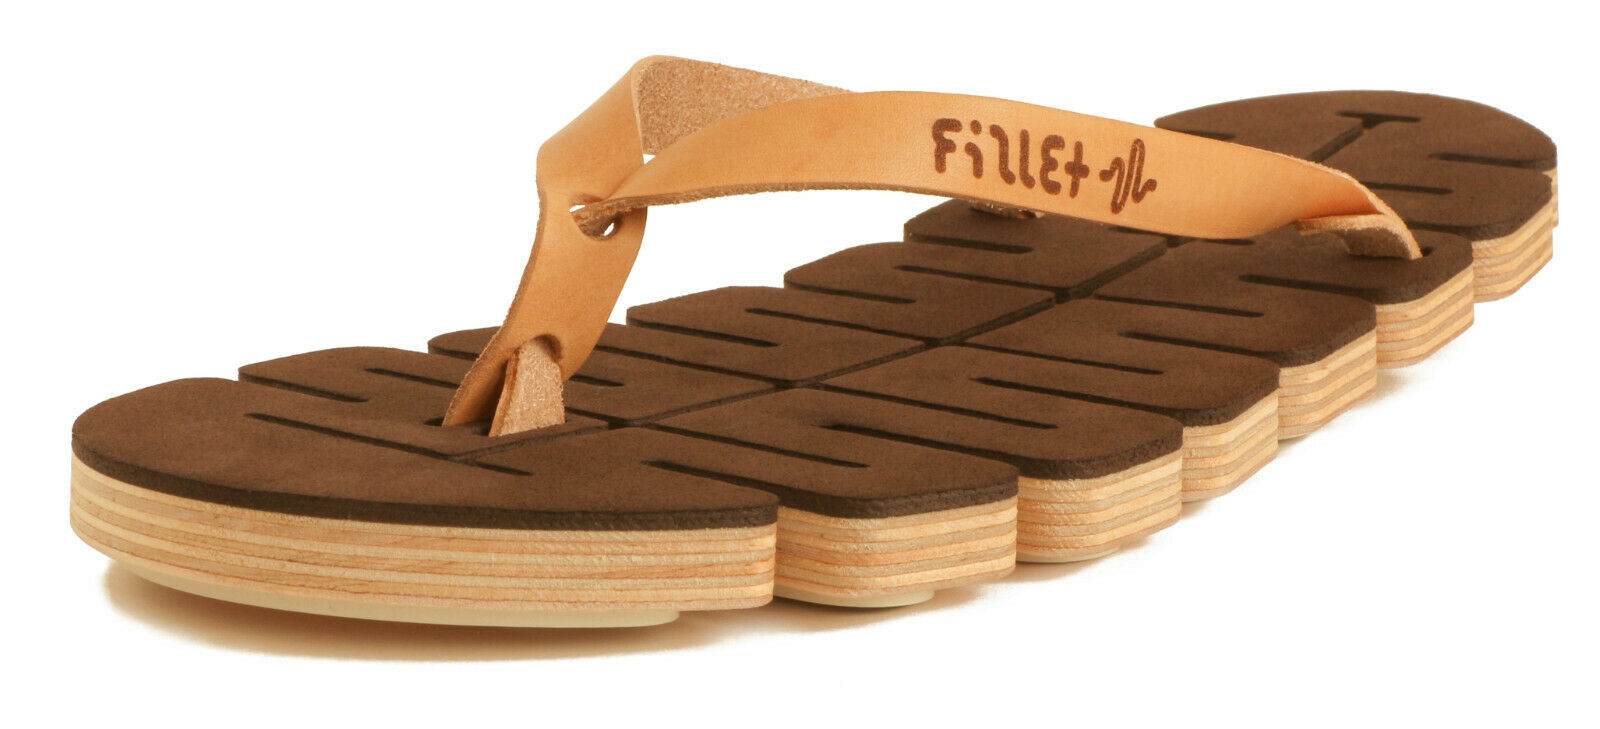 utilis  - madera flexible-sandalia fillet-sandalias-chanclas-señora caballero